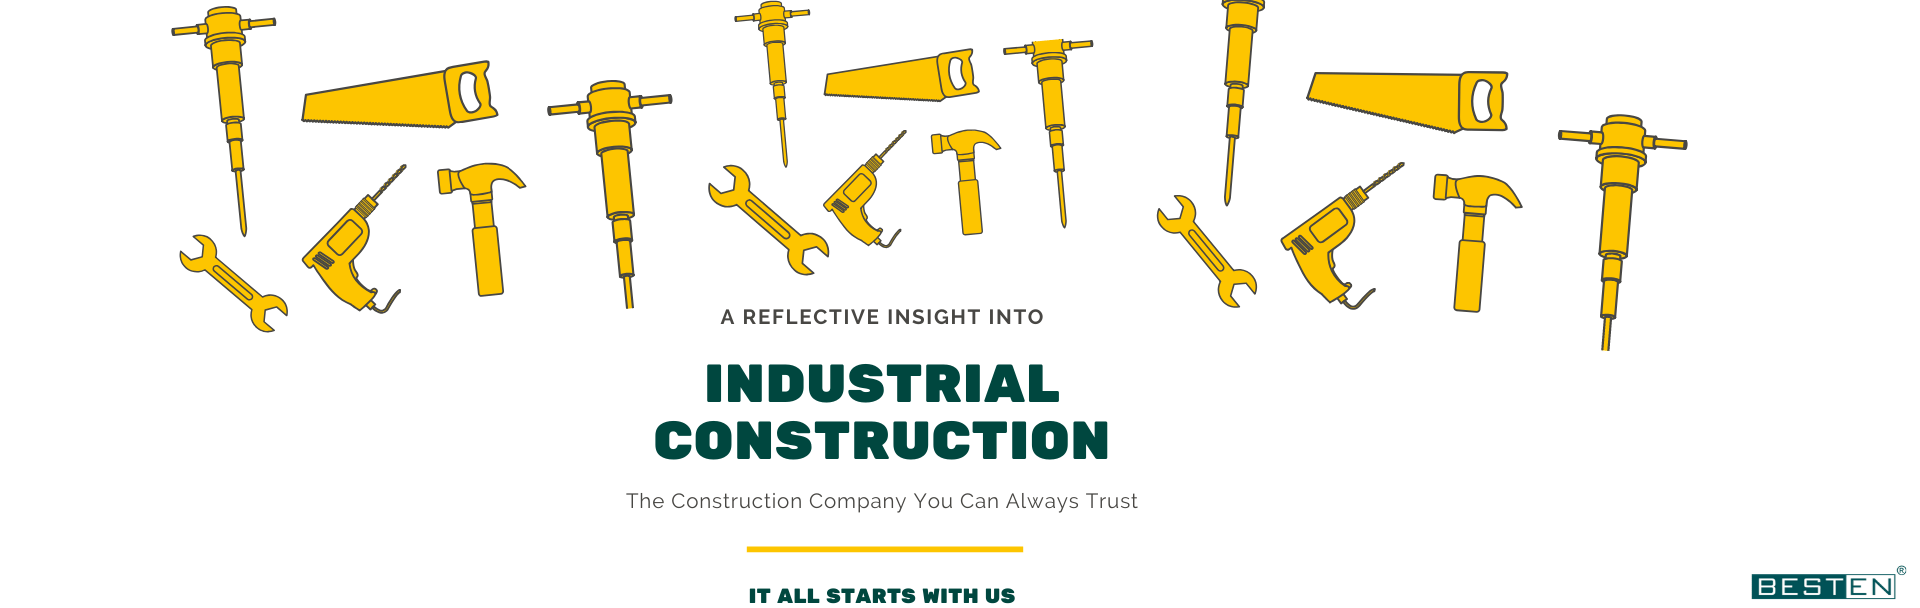 integrated industrial design